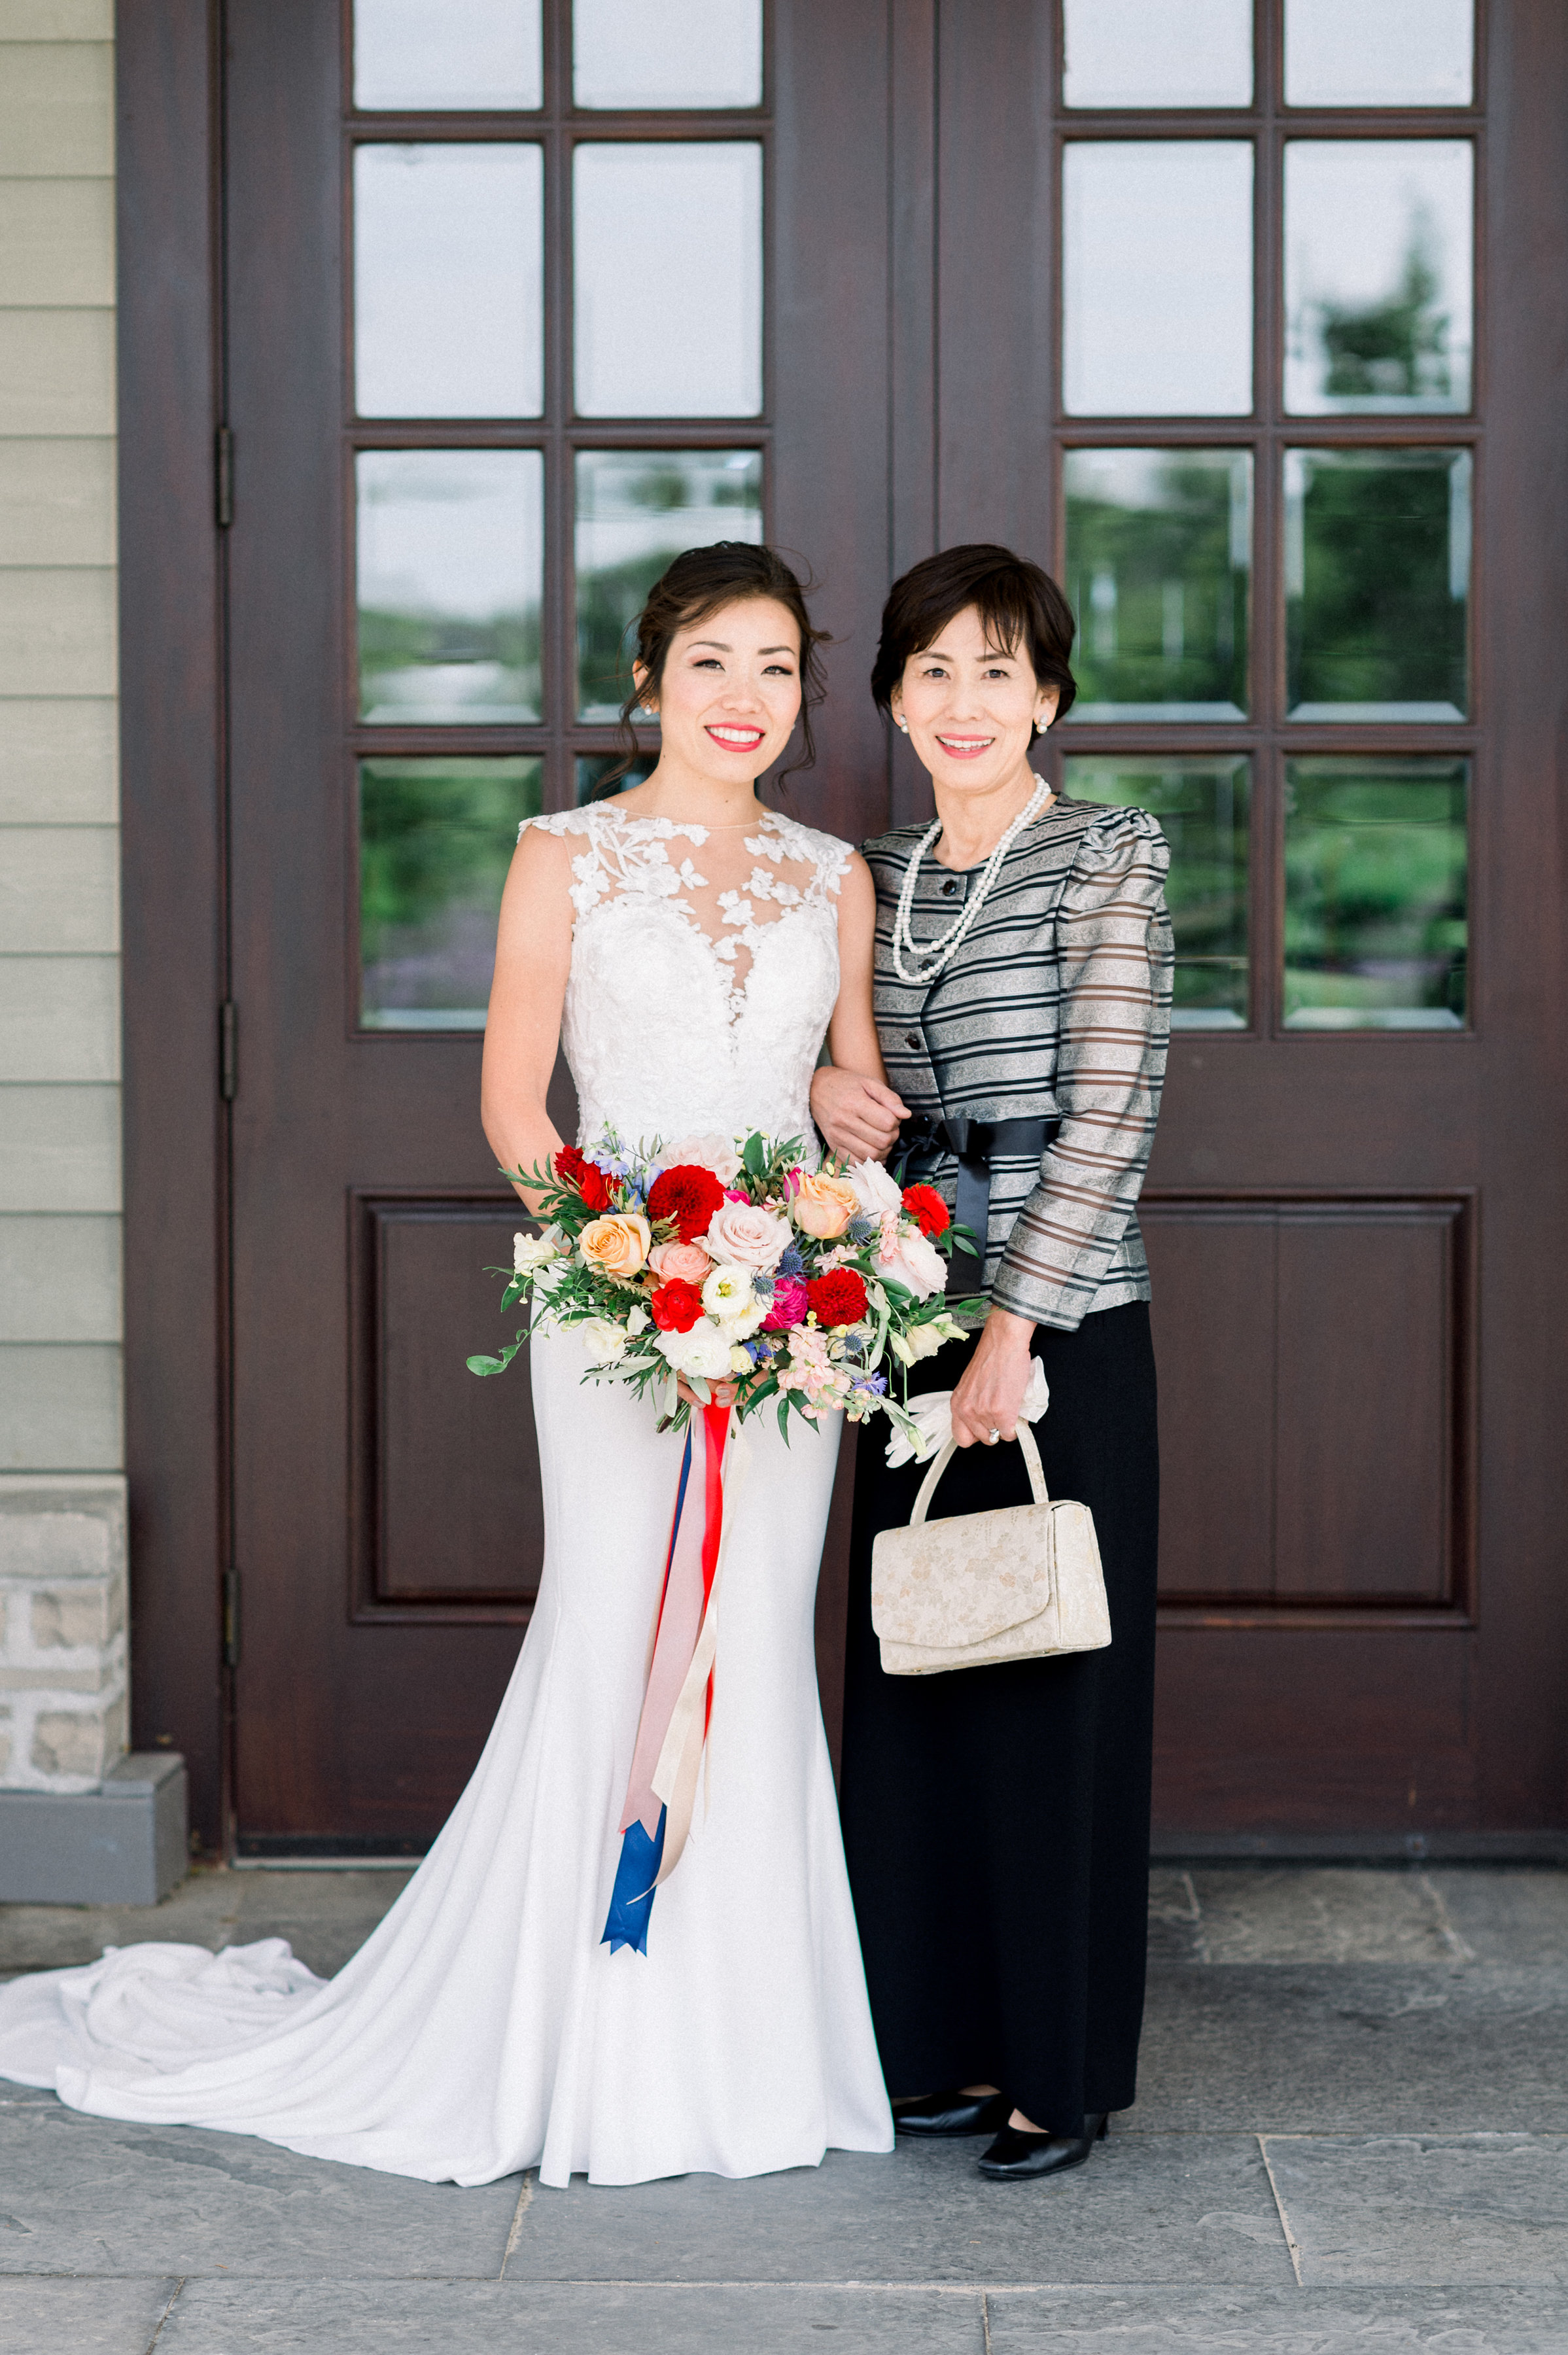 Mamiko-Aaron-Wedding-Whitney-Heard-Photography-6137.jpg